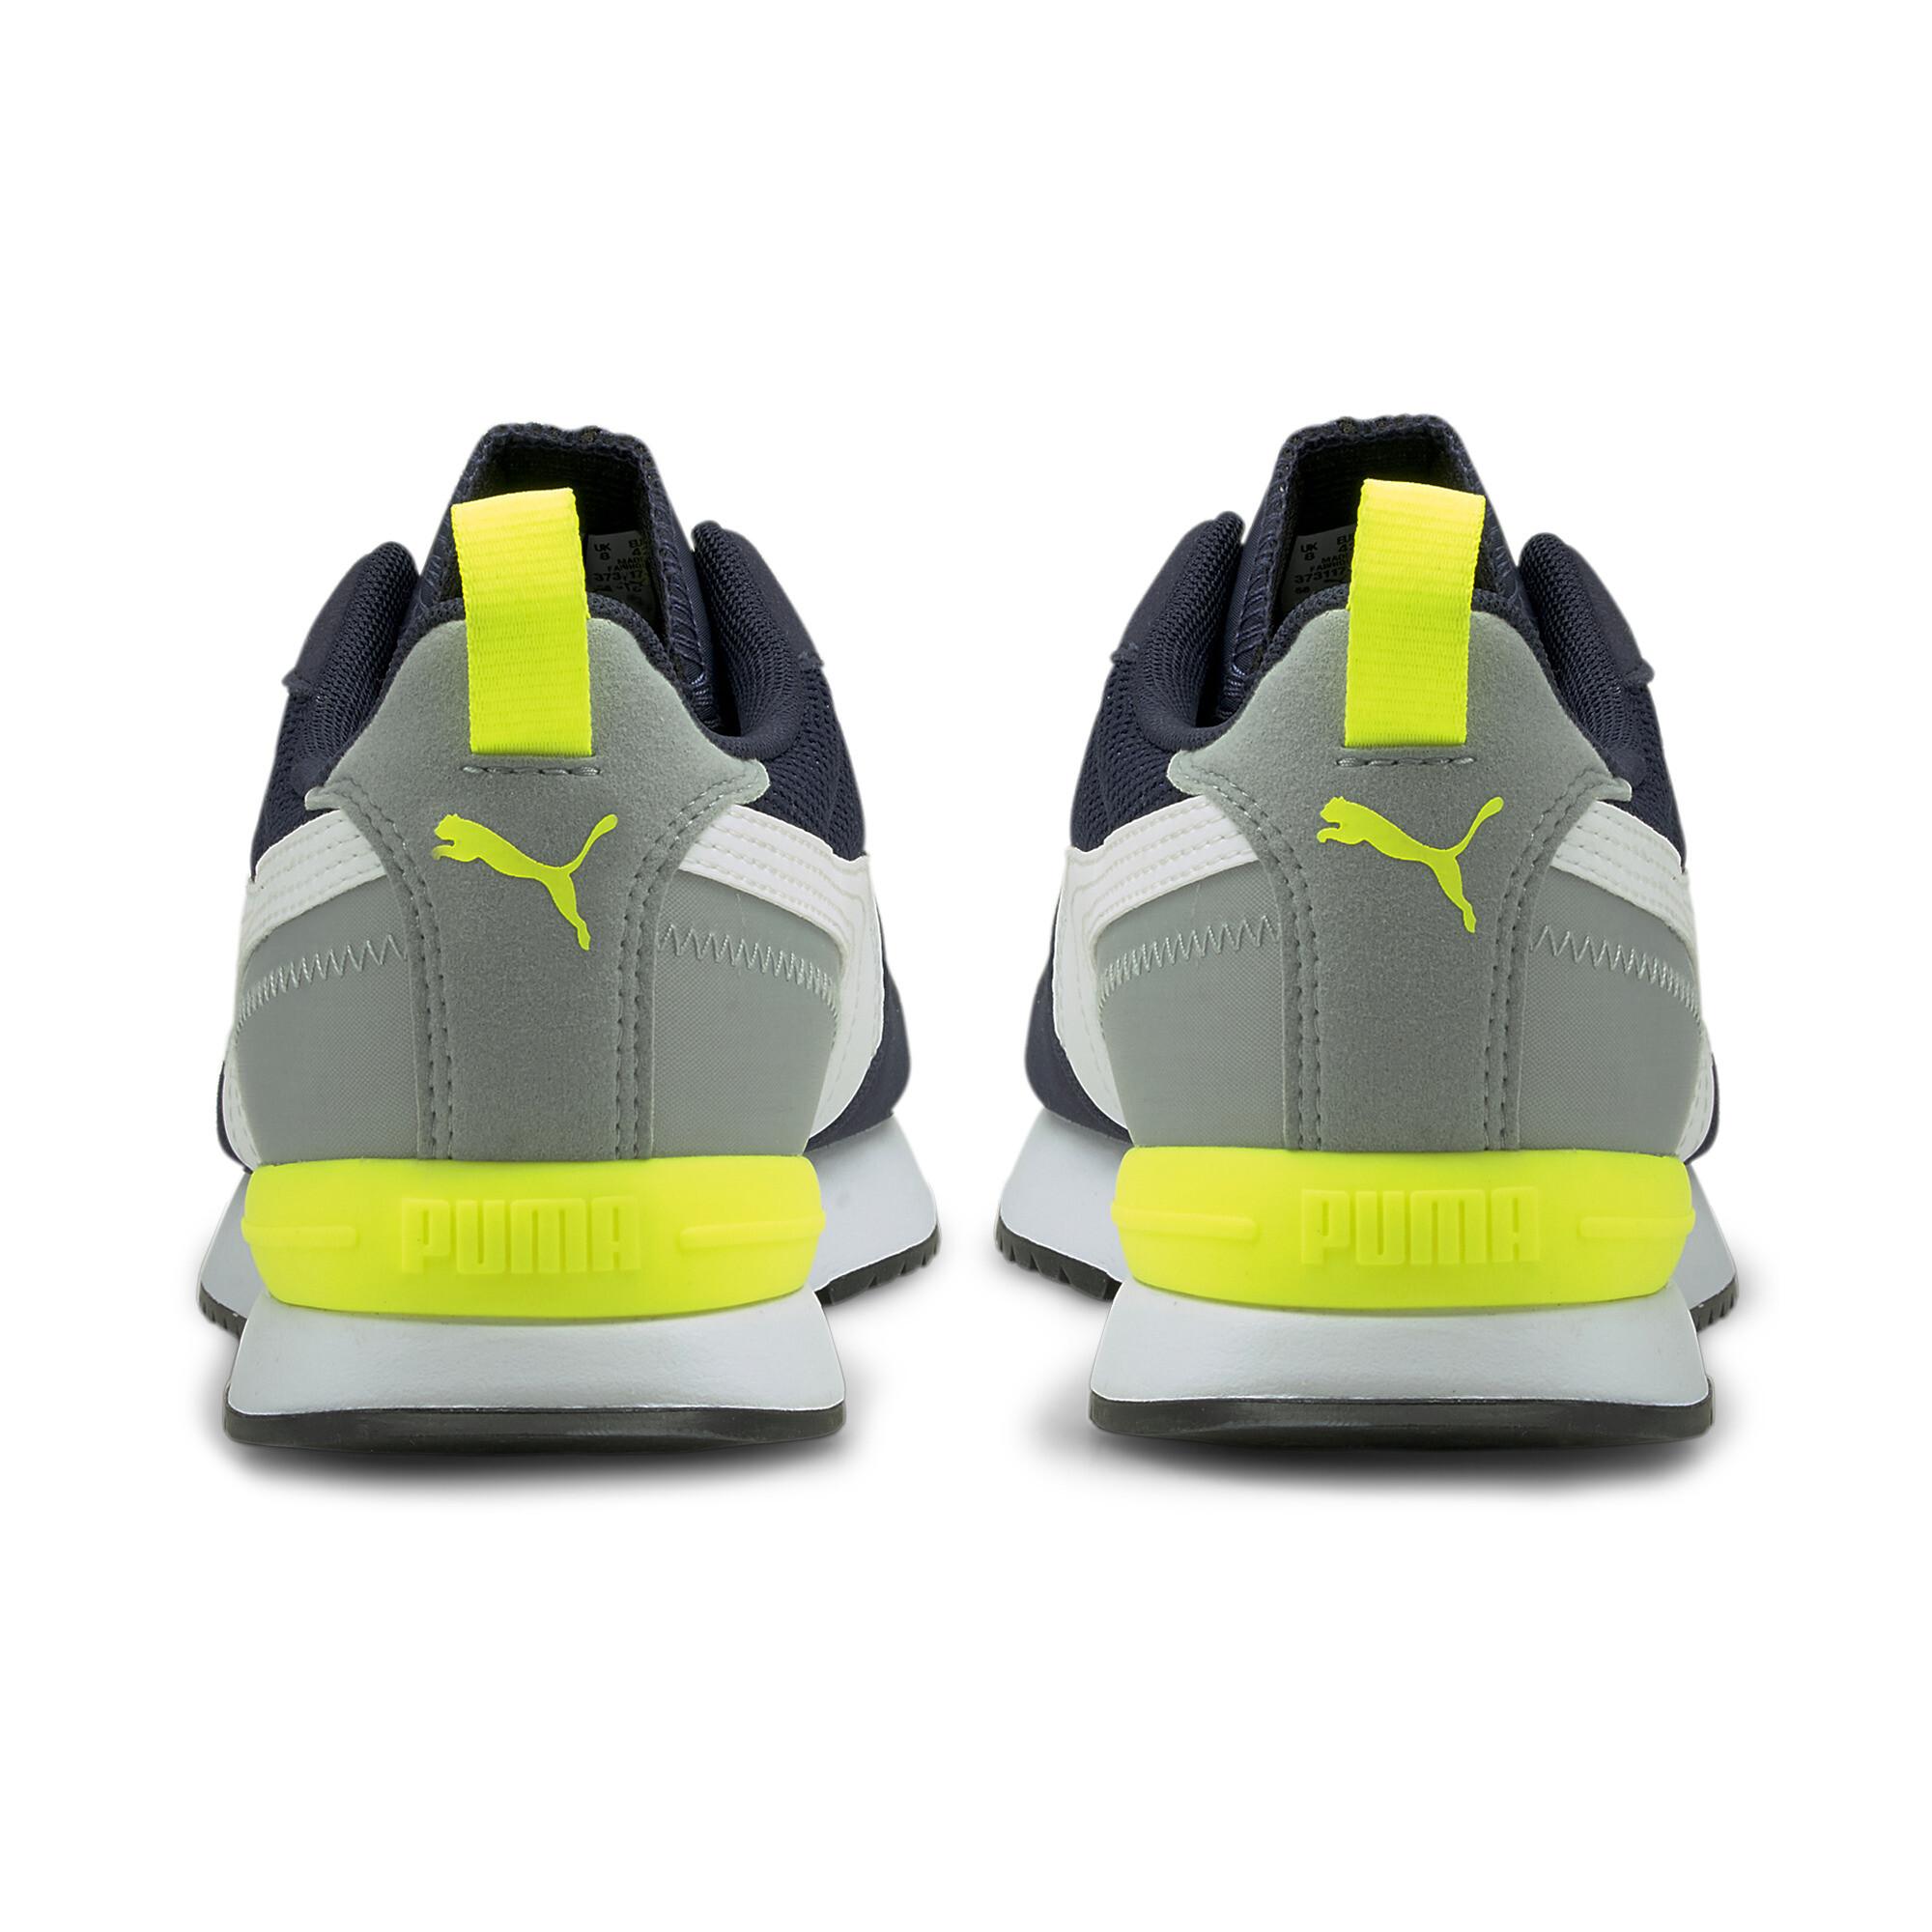 thumbnail 7 - PUMA-Men-039-s-R78-Sneakers